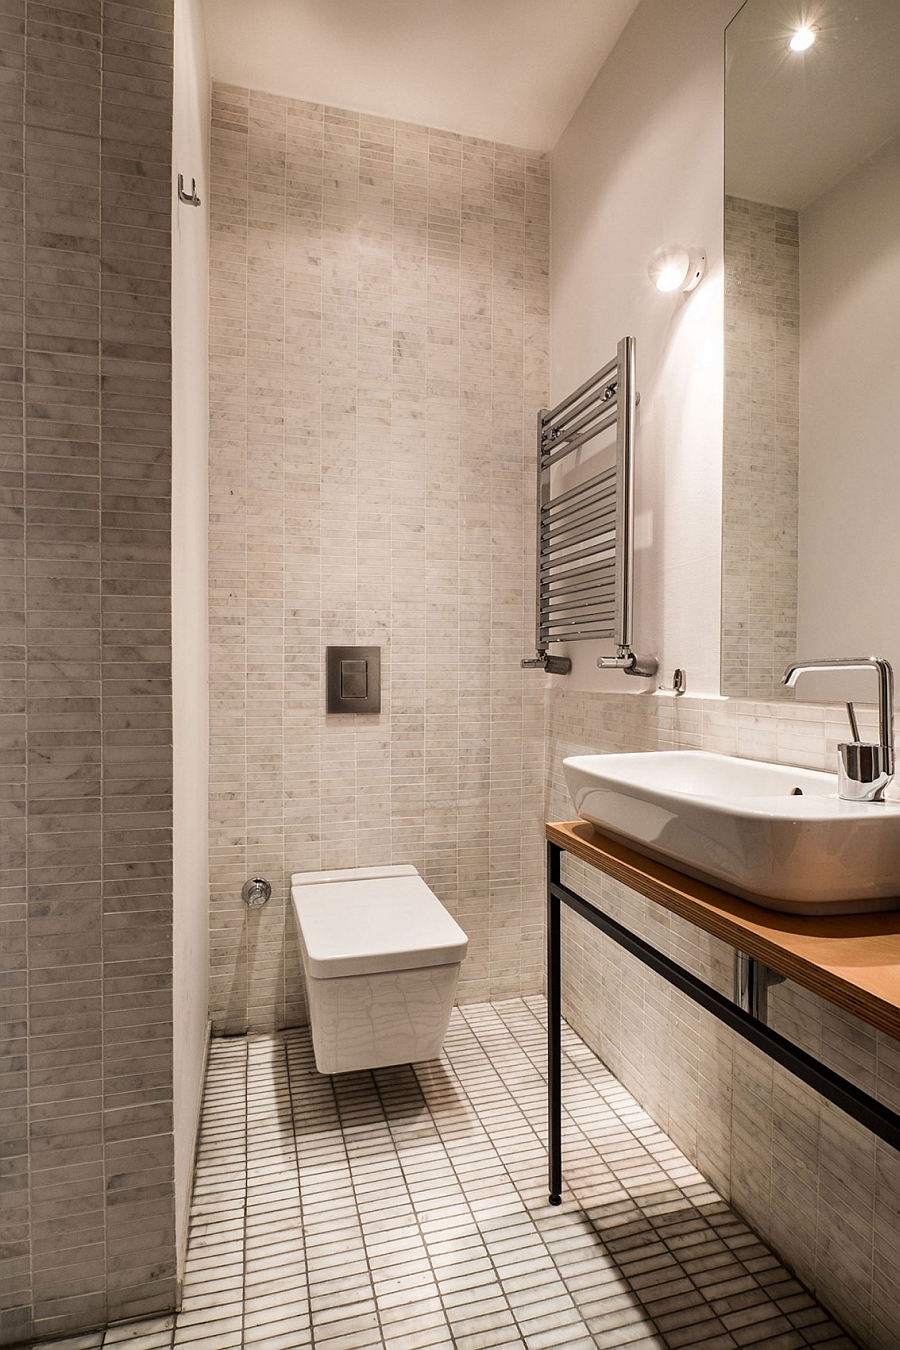 بالصور حمامات مودرن , اجدد موديلات حمامات بتصاميم مميزة 2737 1